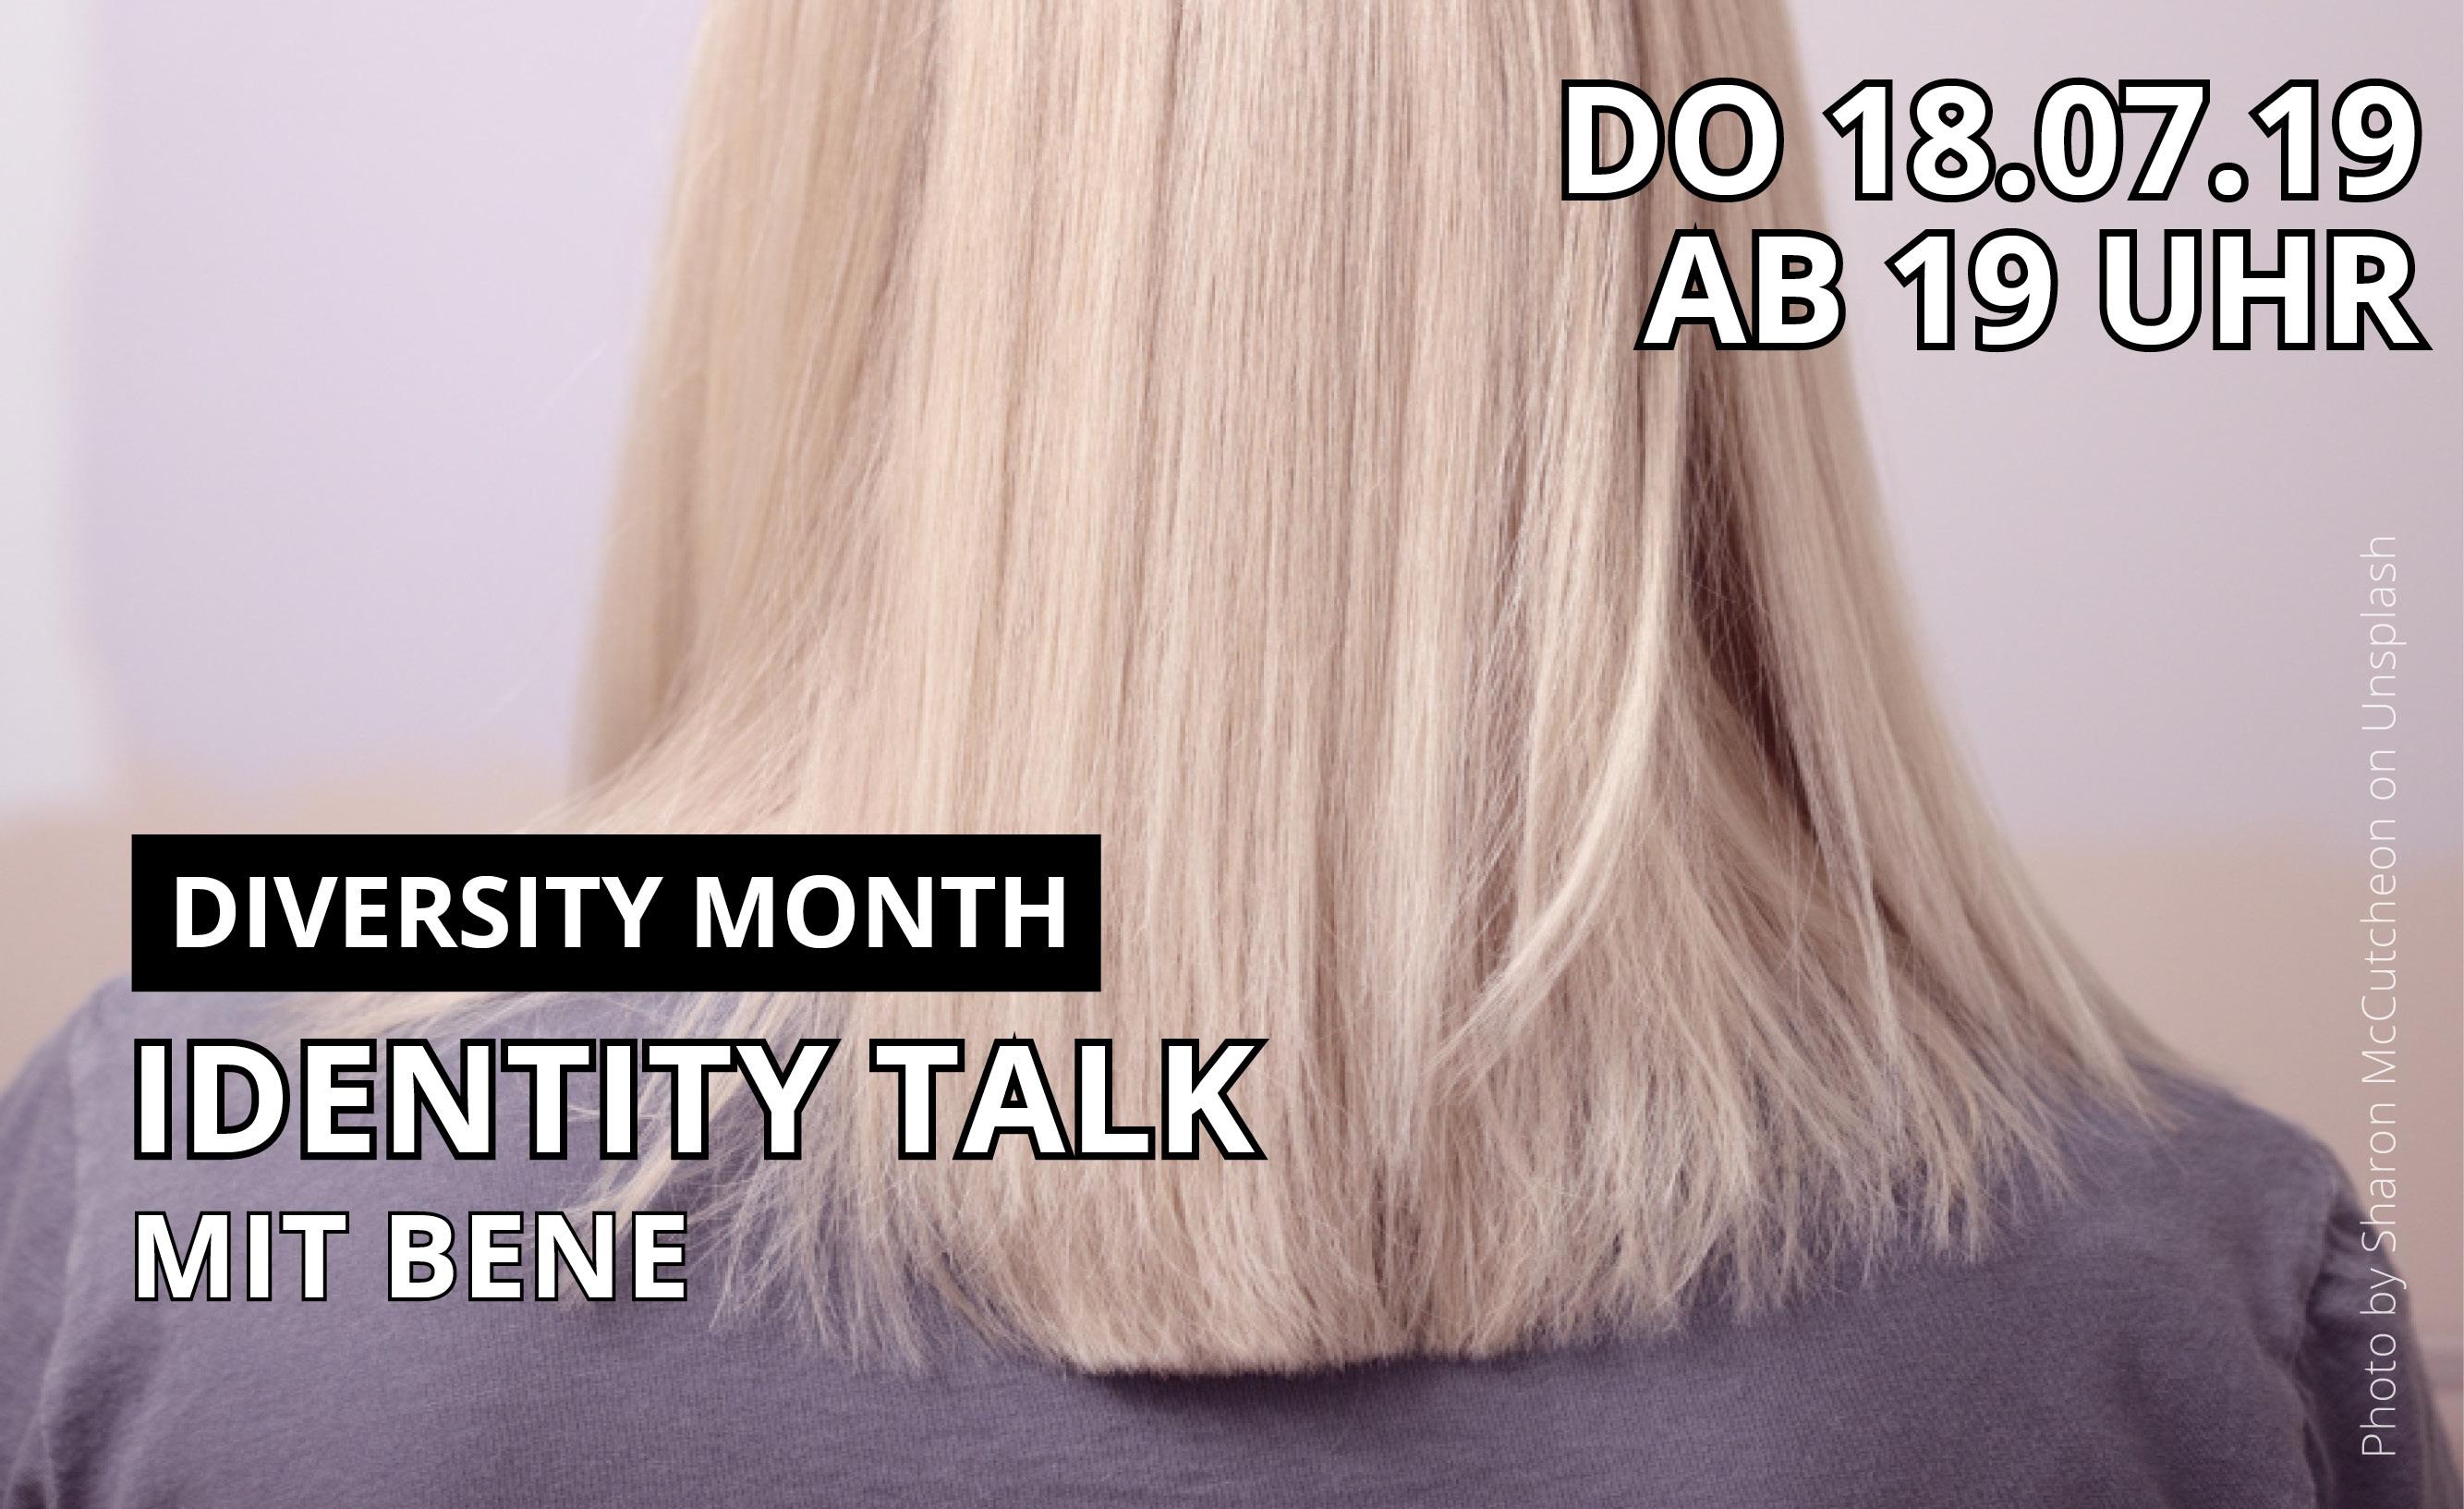 identity-talk 19 uhr